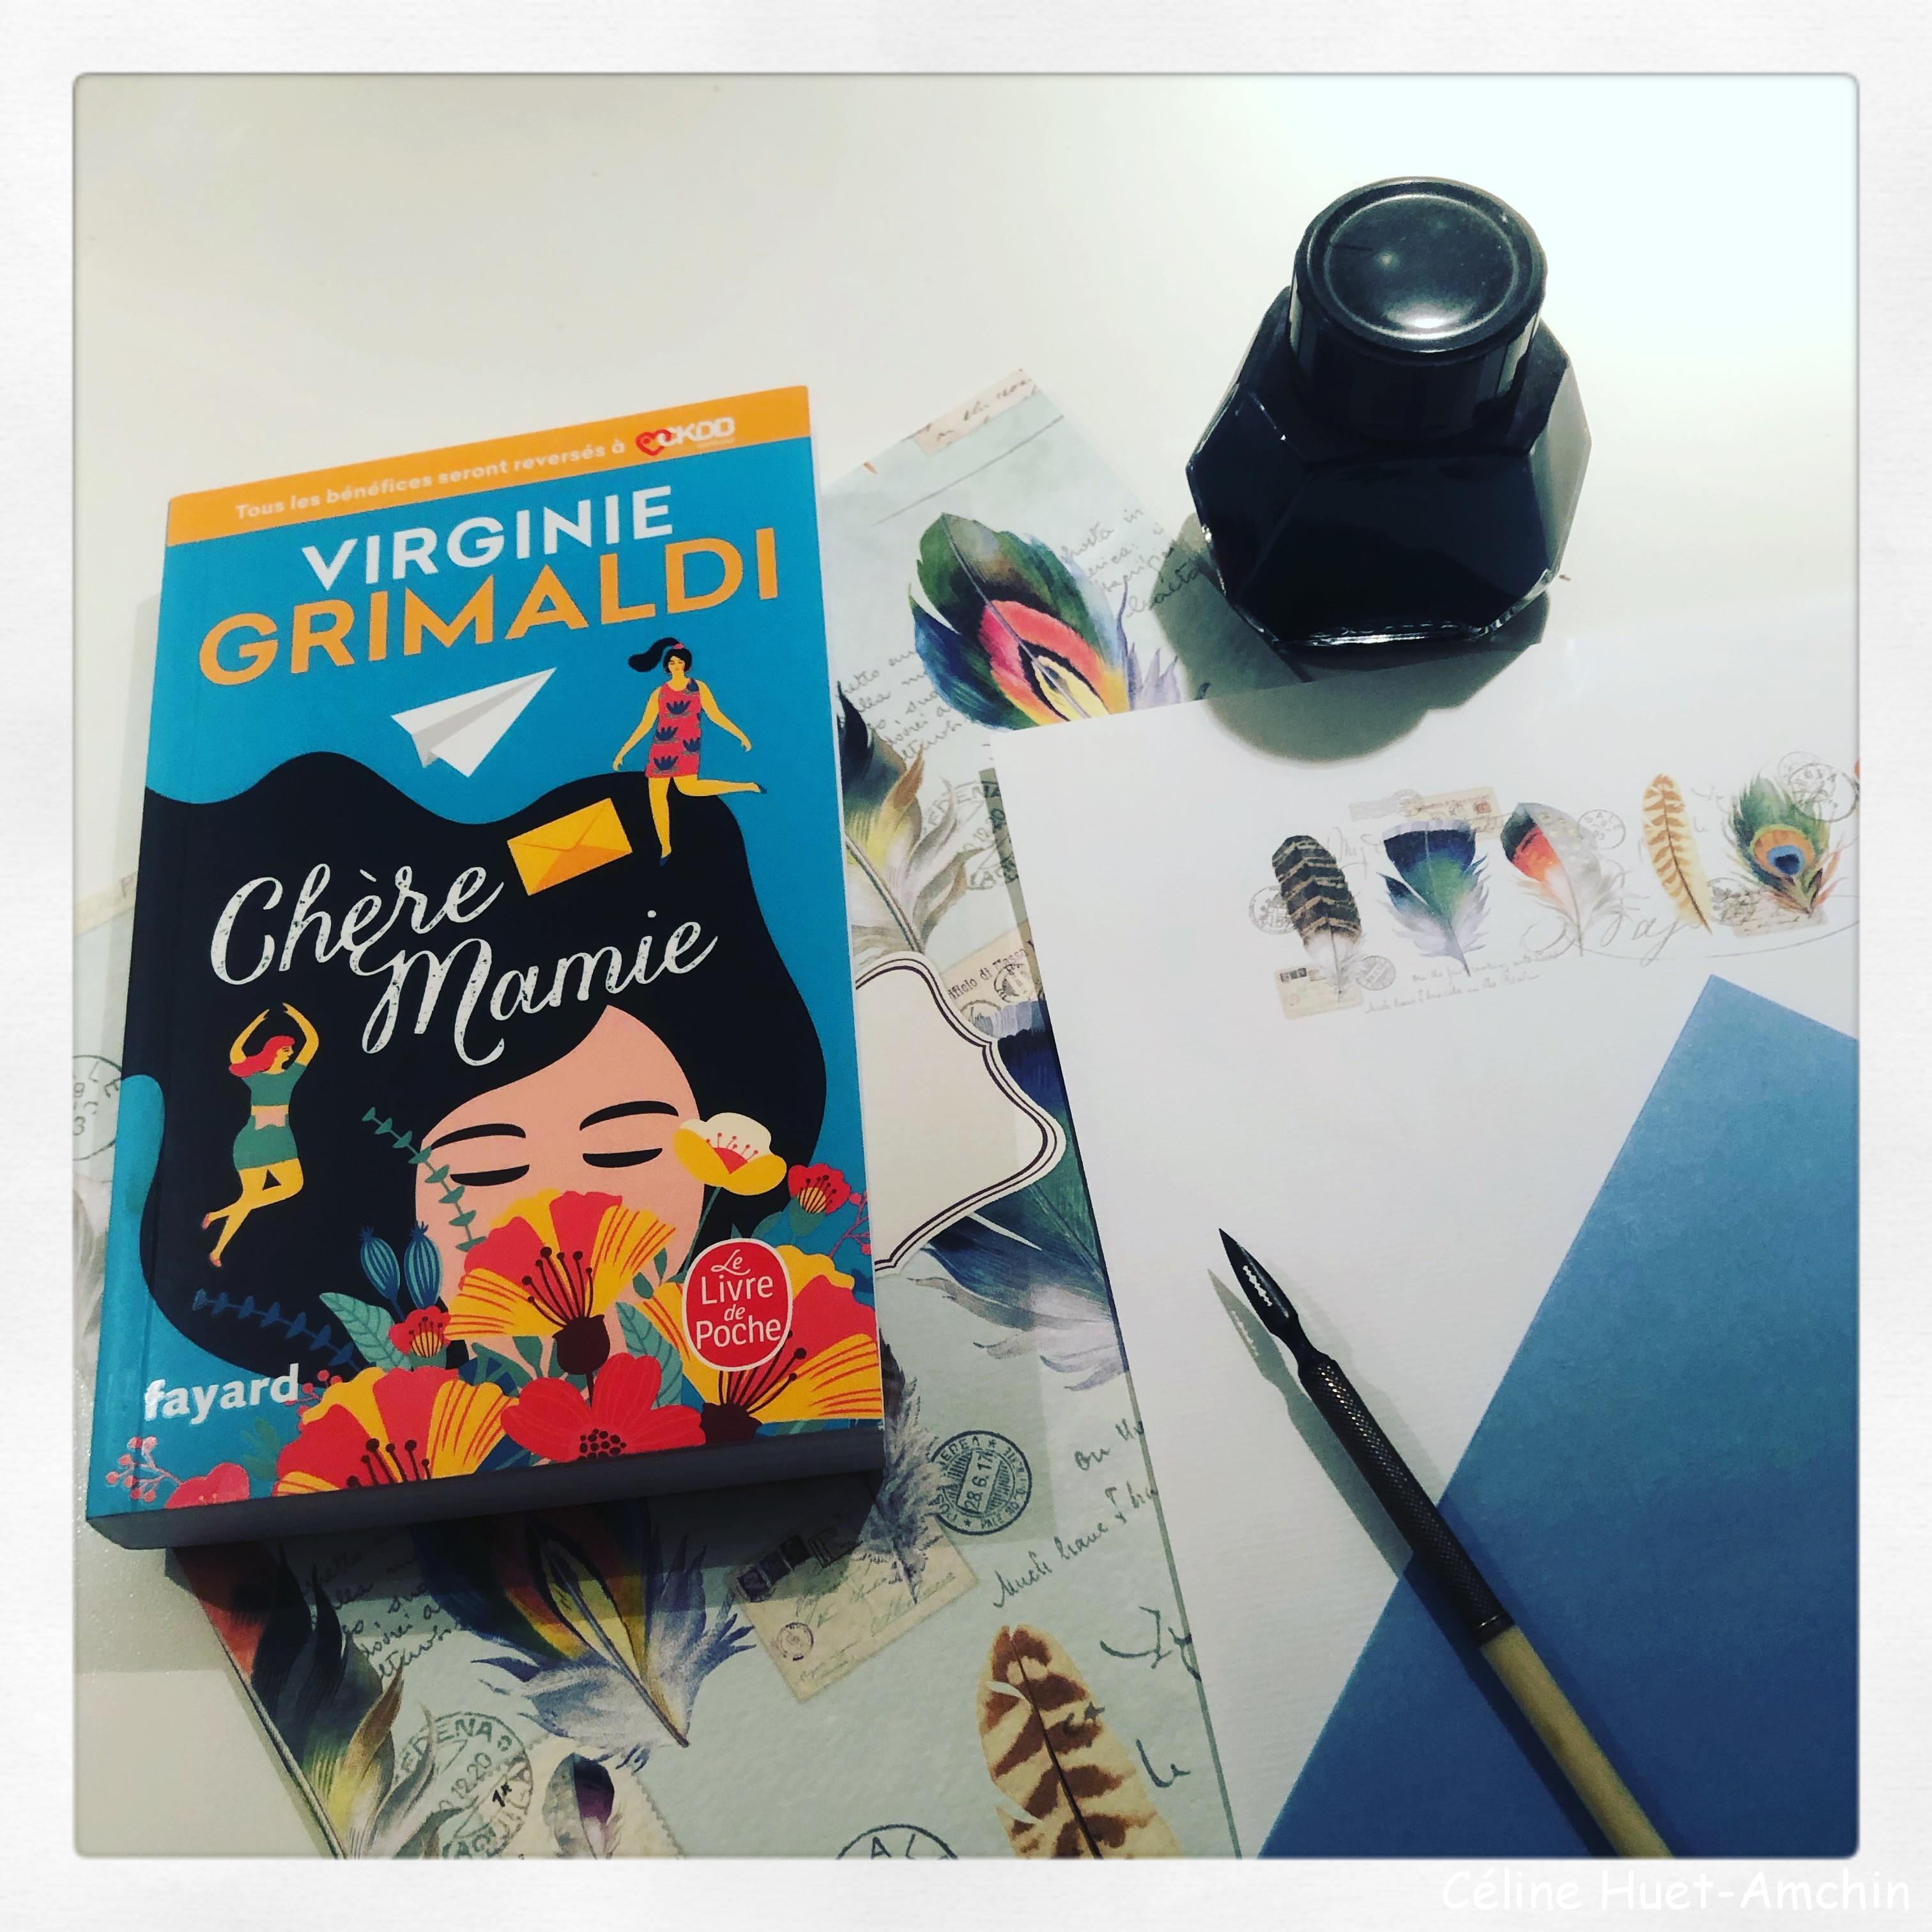 Chère Mamie Virginie Grimaldi Editions Fayard Le Livre de Poche